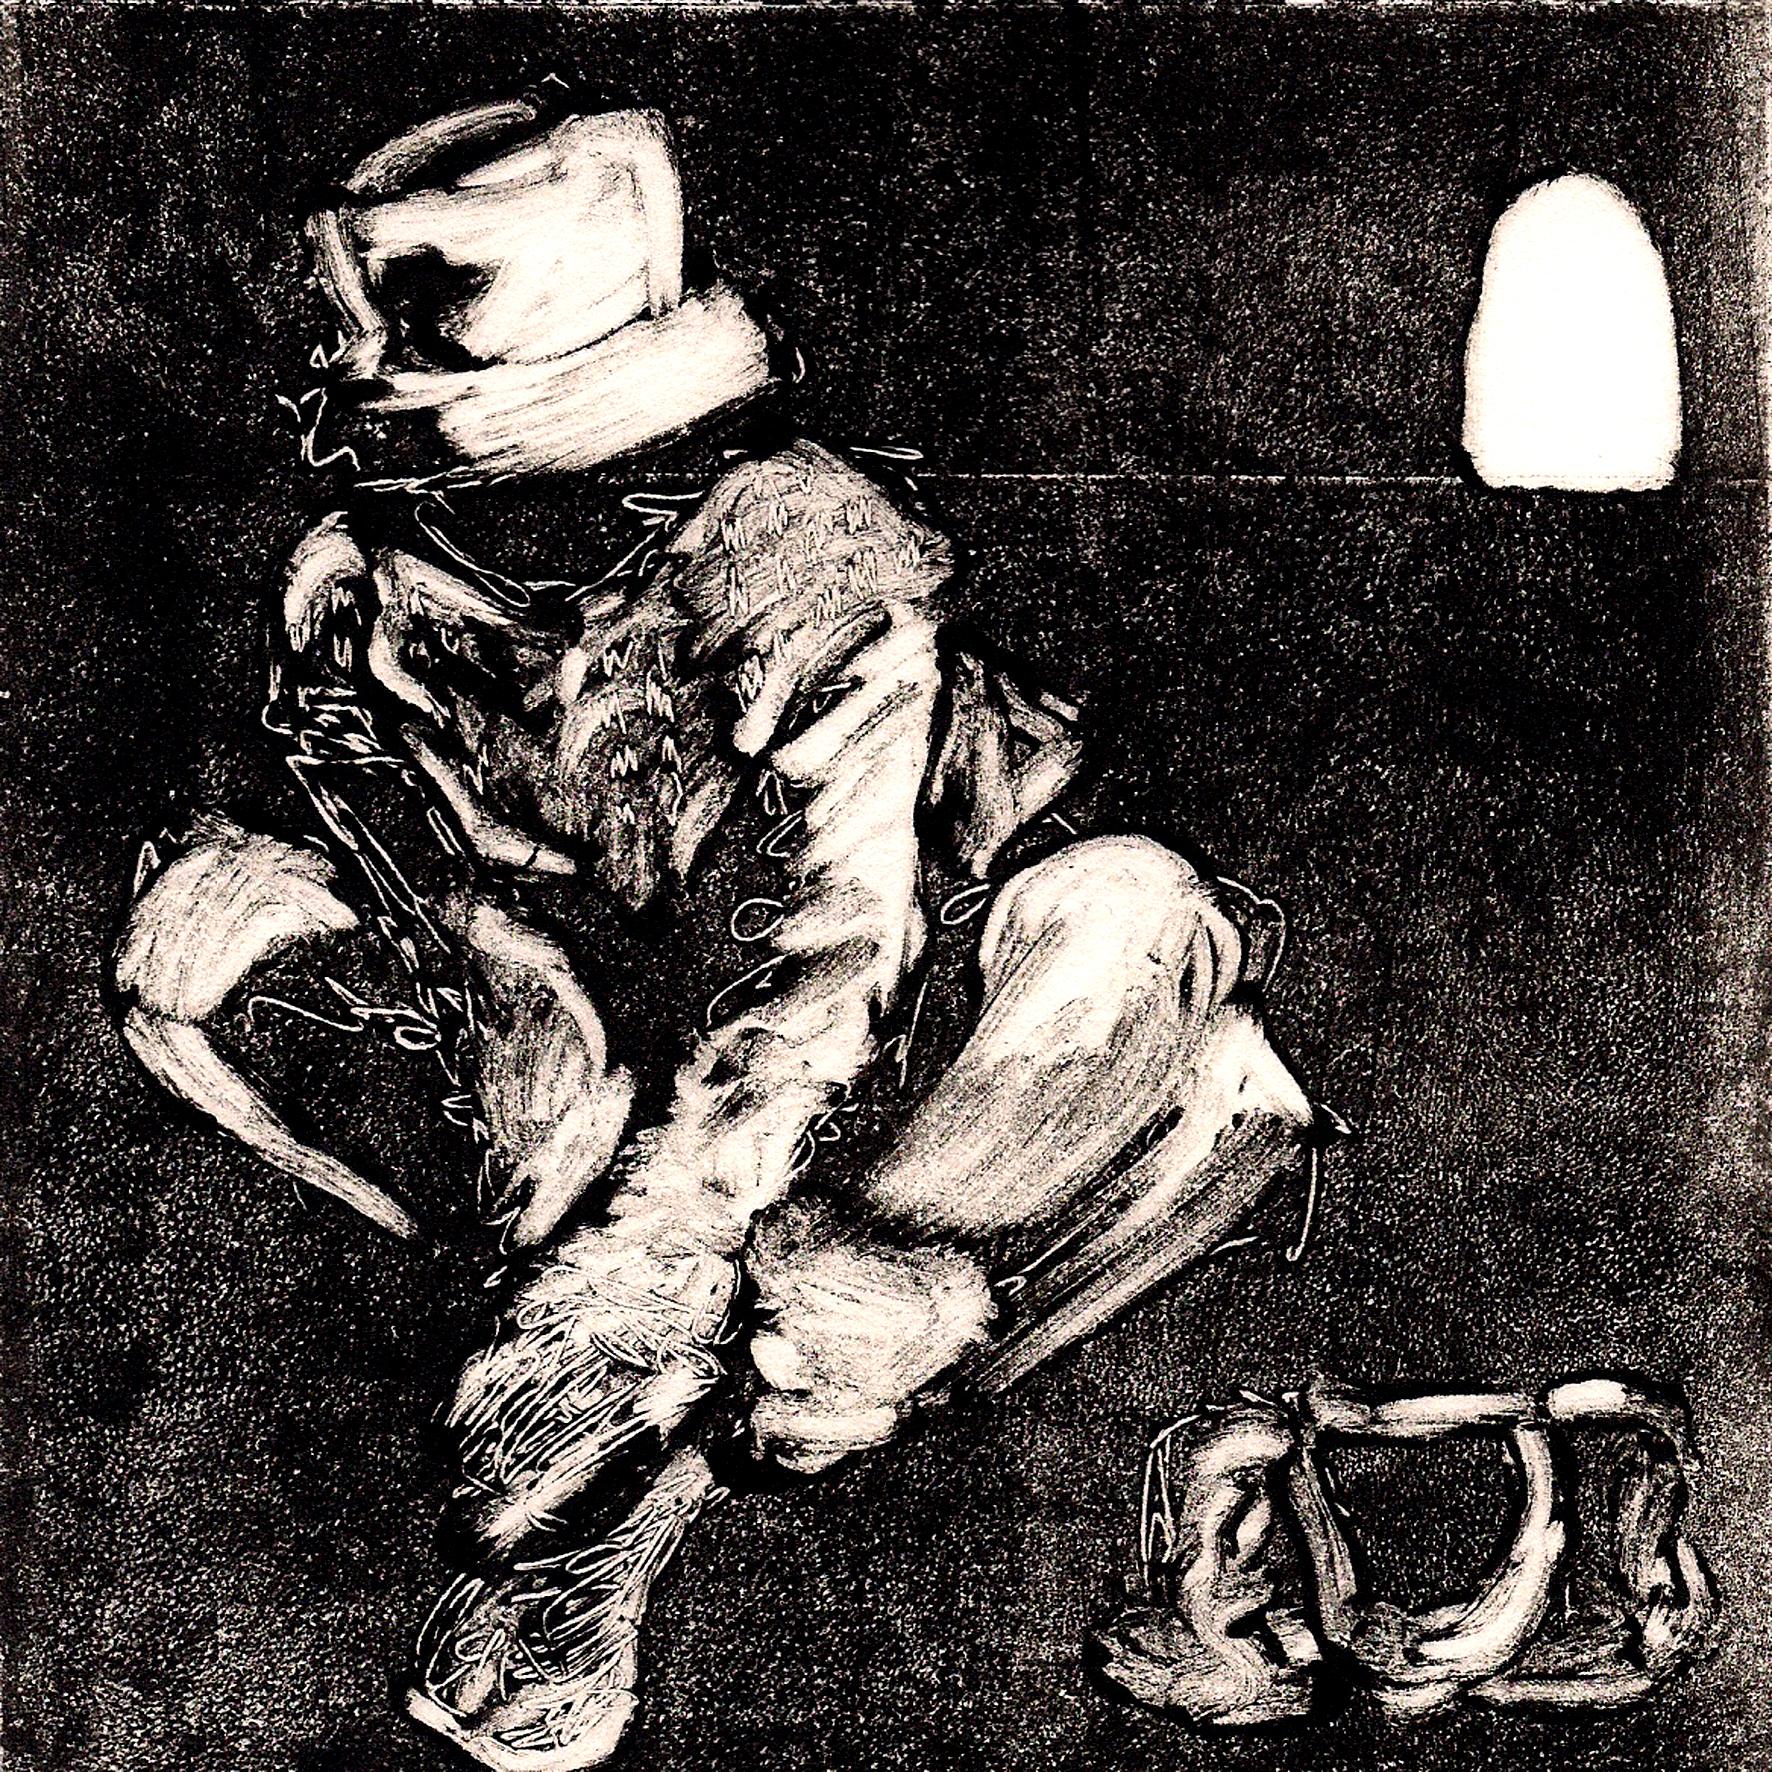 Feminine 2010, monotype on japanese paper, 15x15 cm